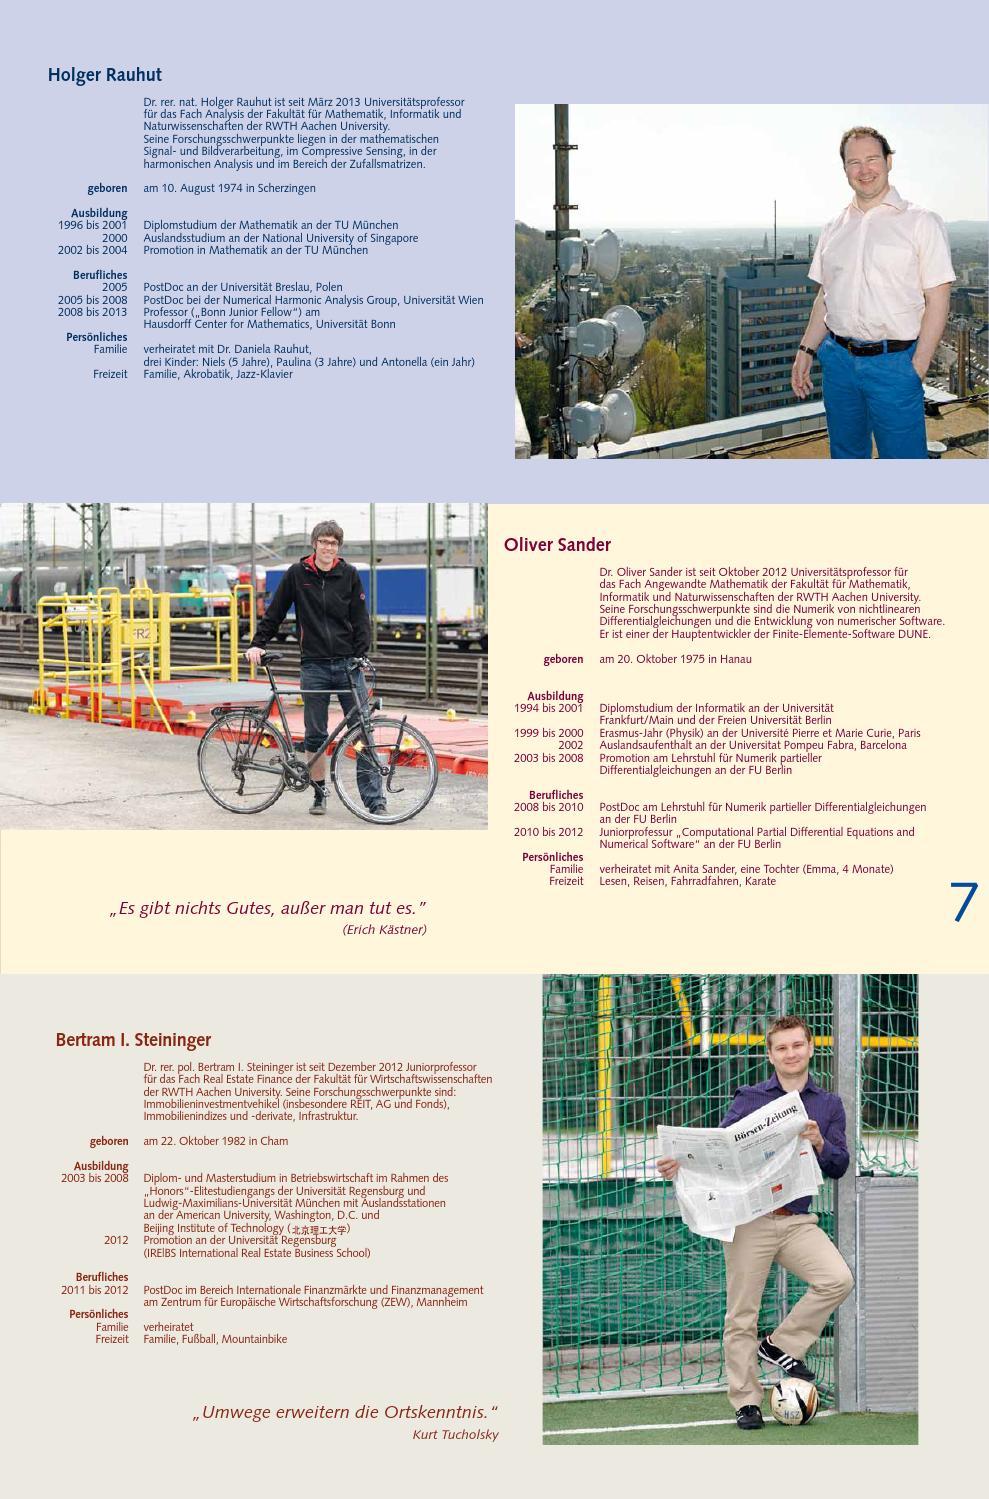 RWTHInsight 1/2013 by RWTH Aachen University - issuu